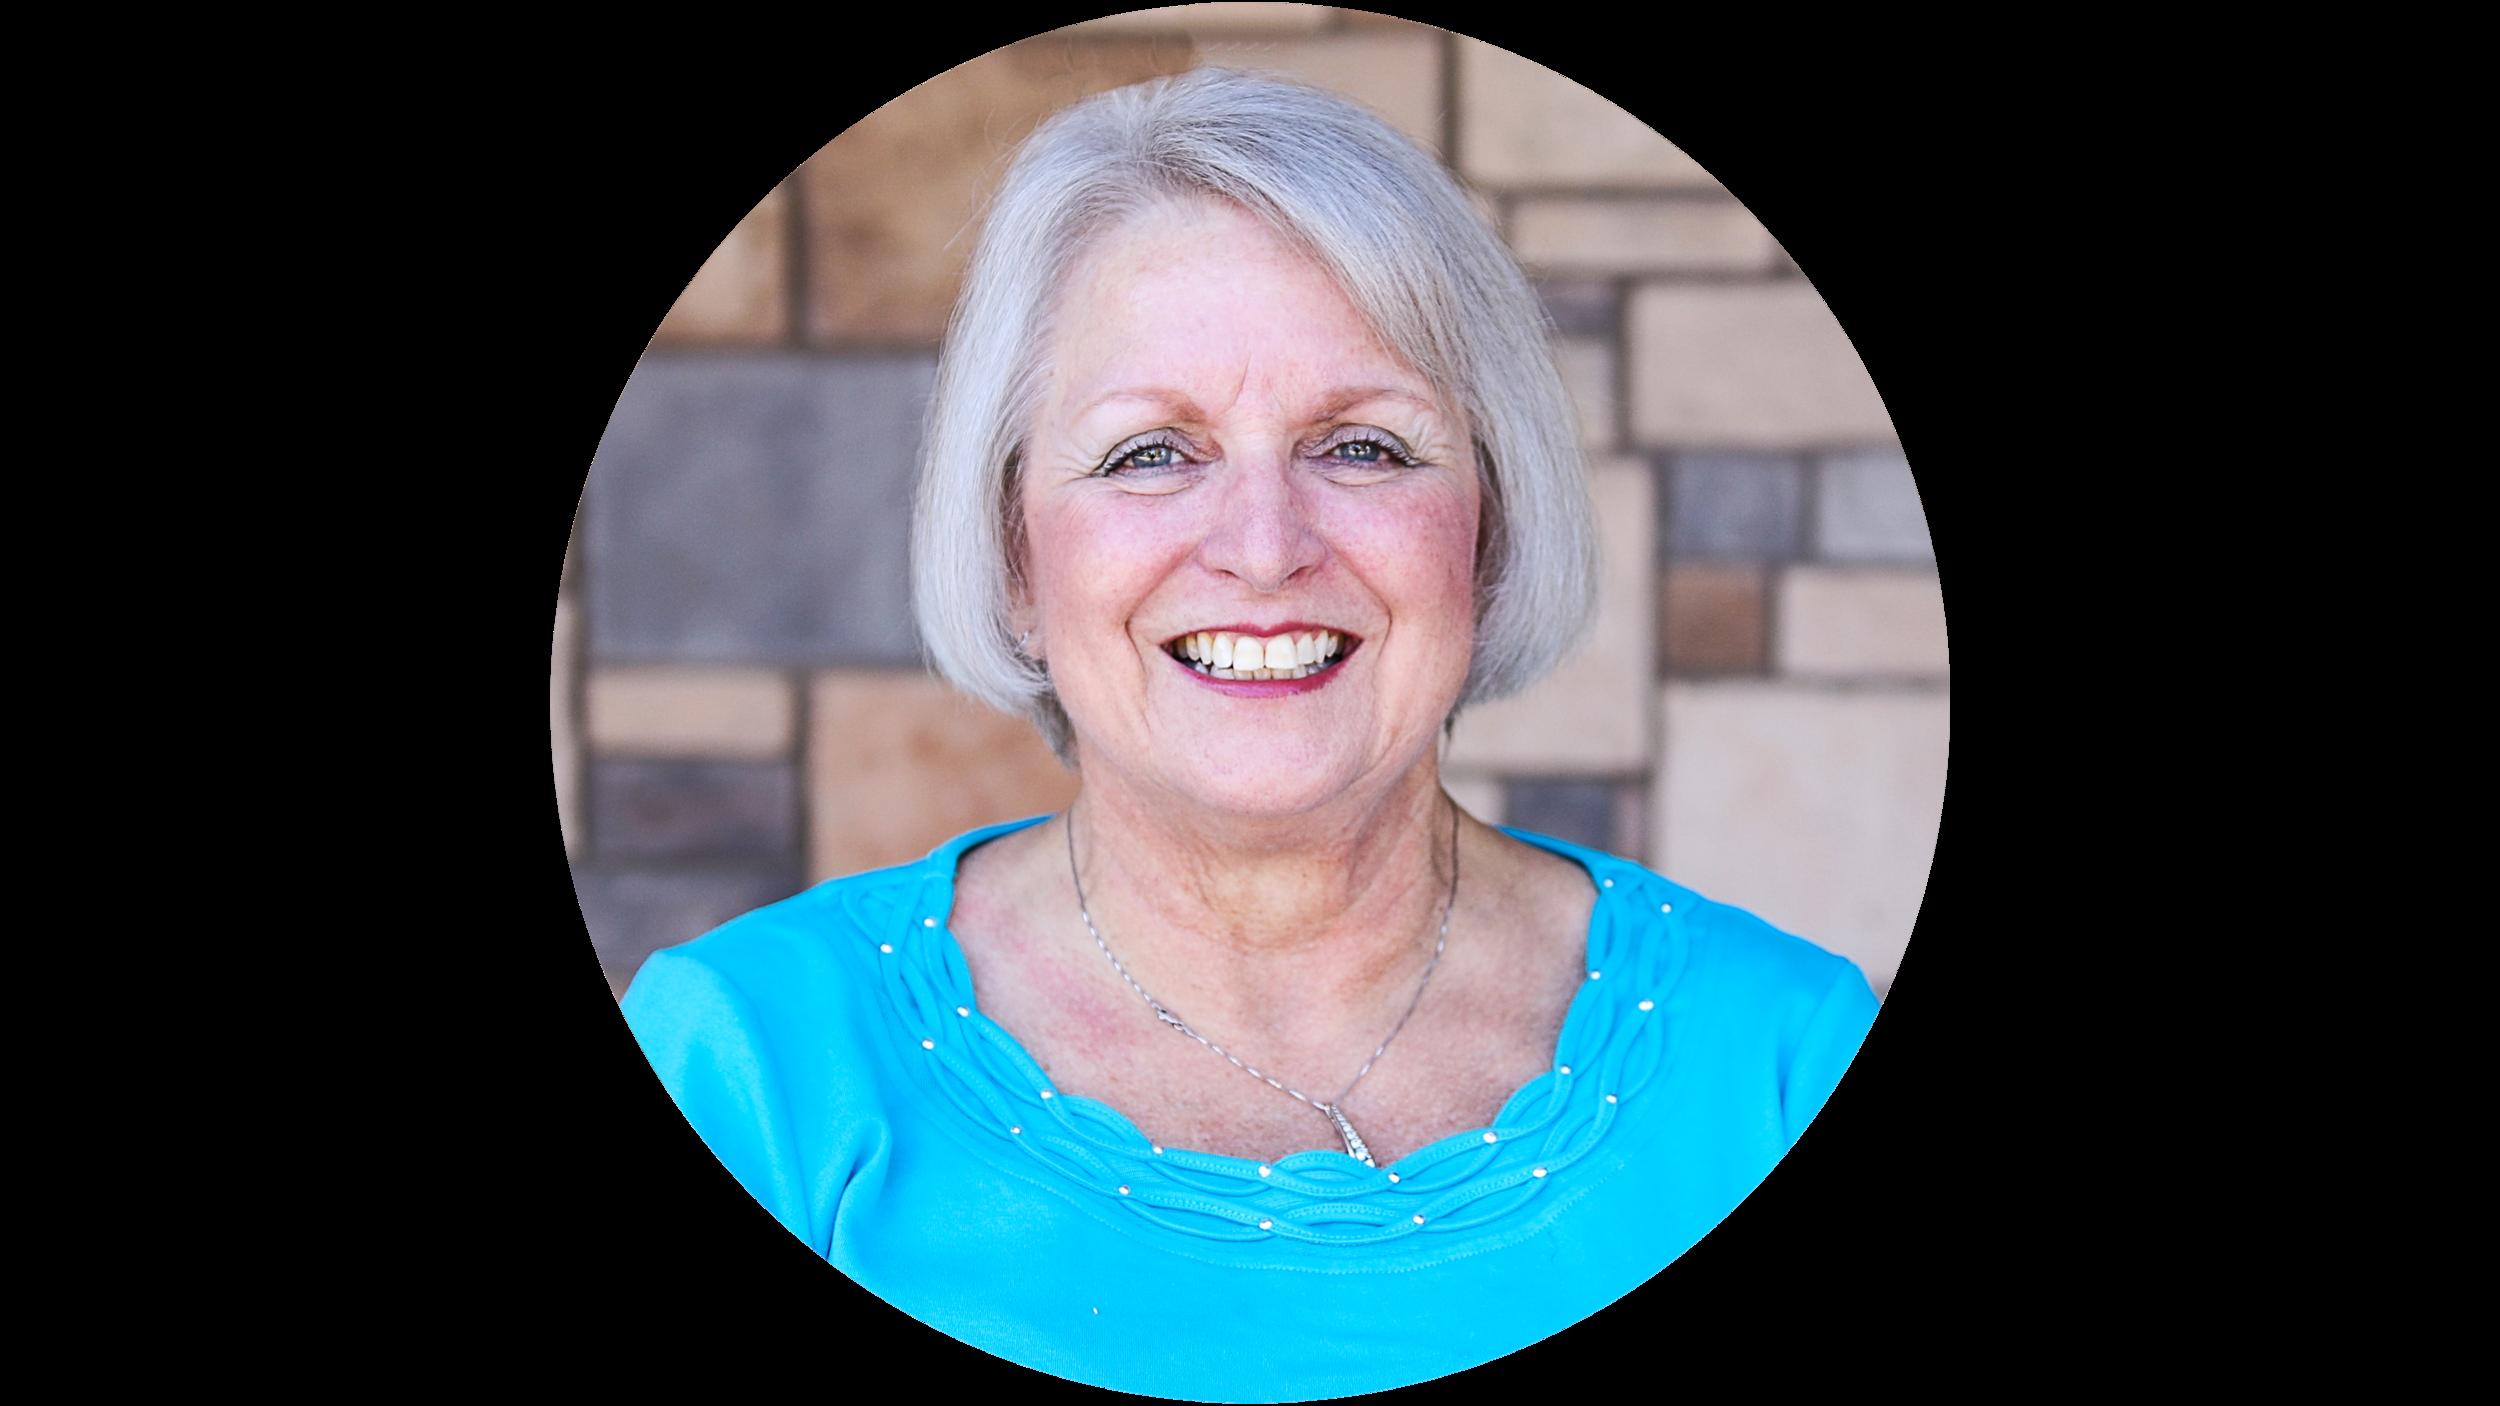 Sharon Clark - FinanceContact Sharon